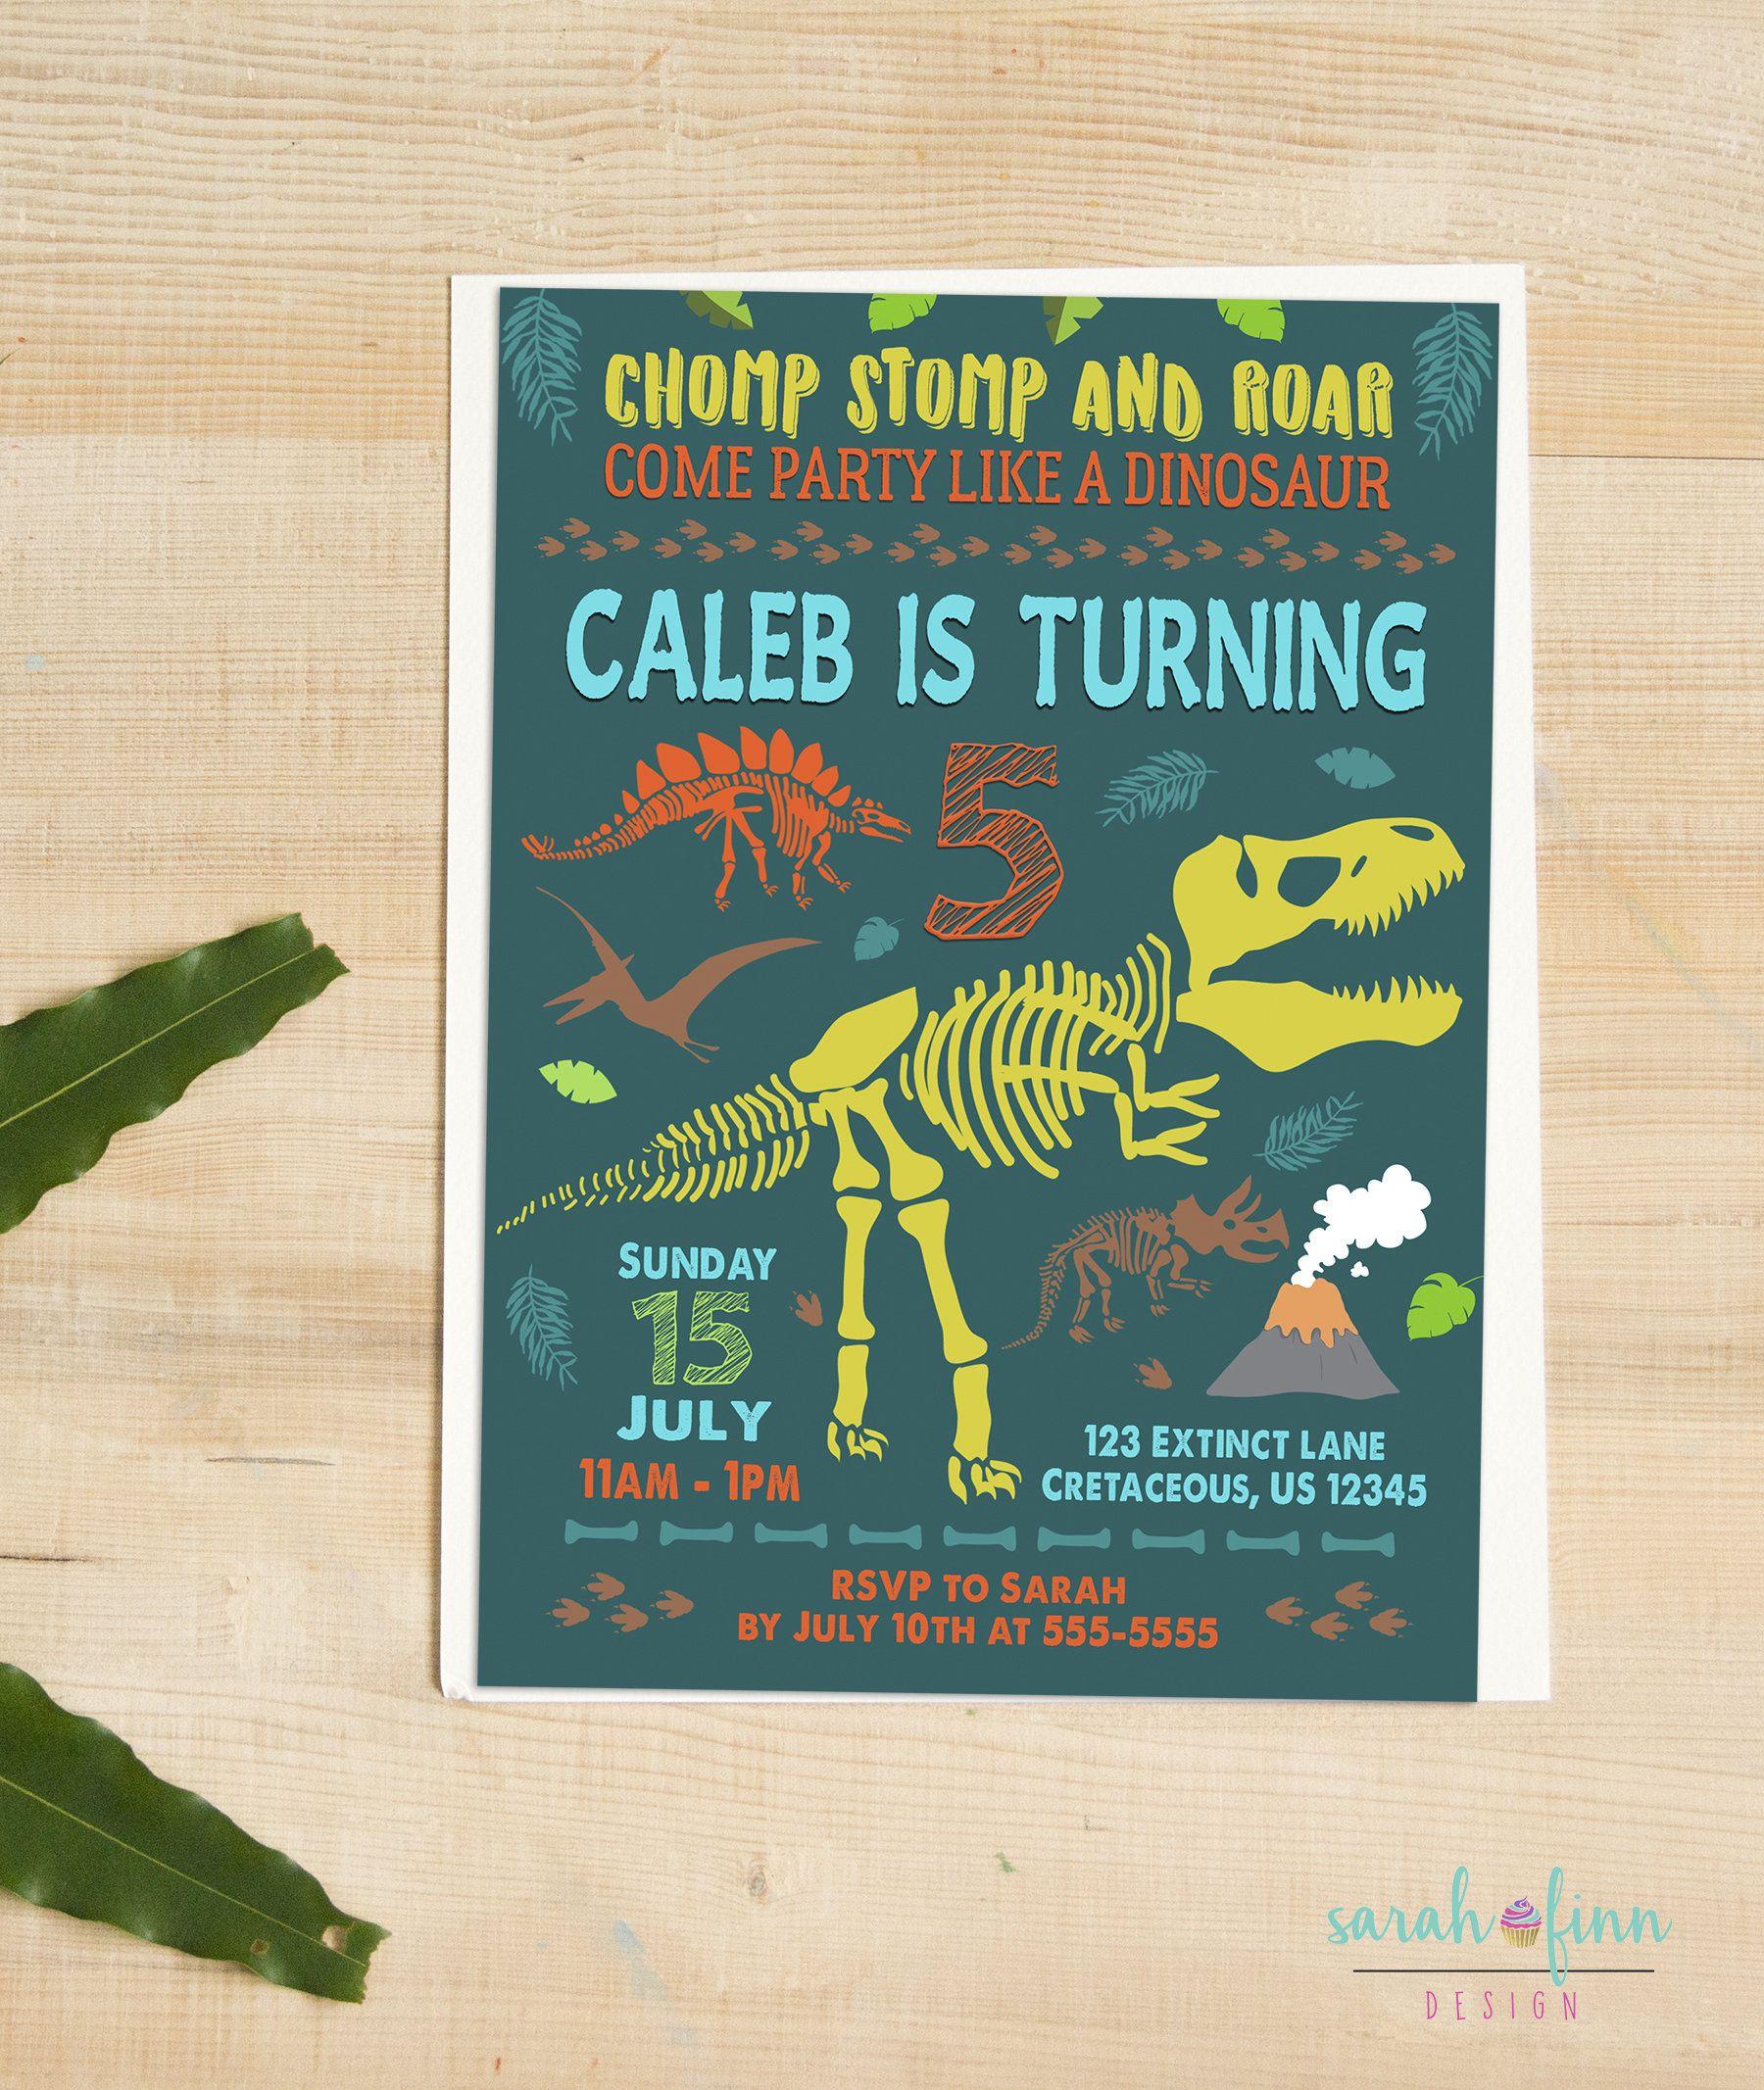 Dinosaur Birthday Invitation Party Printable Fossils T Rex Chomp Stomp Roar Dino Fossil Teal Green Boy Invite By